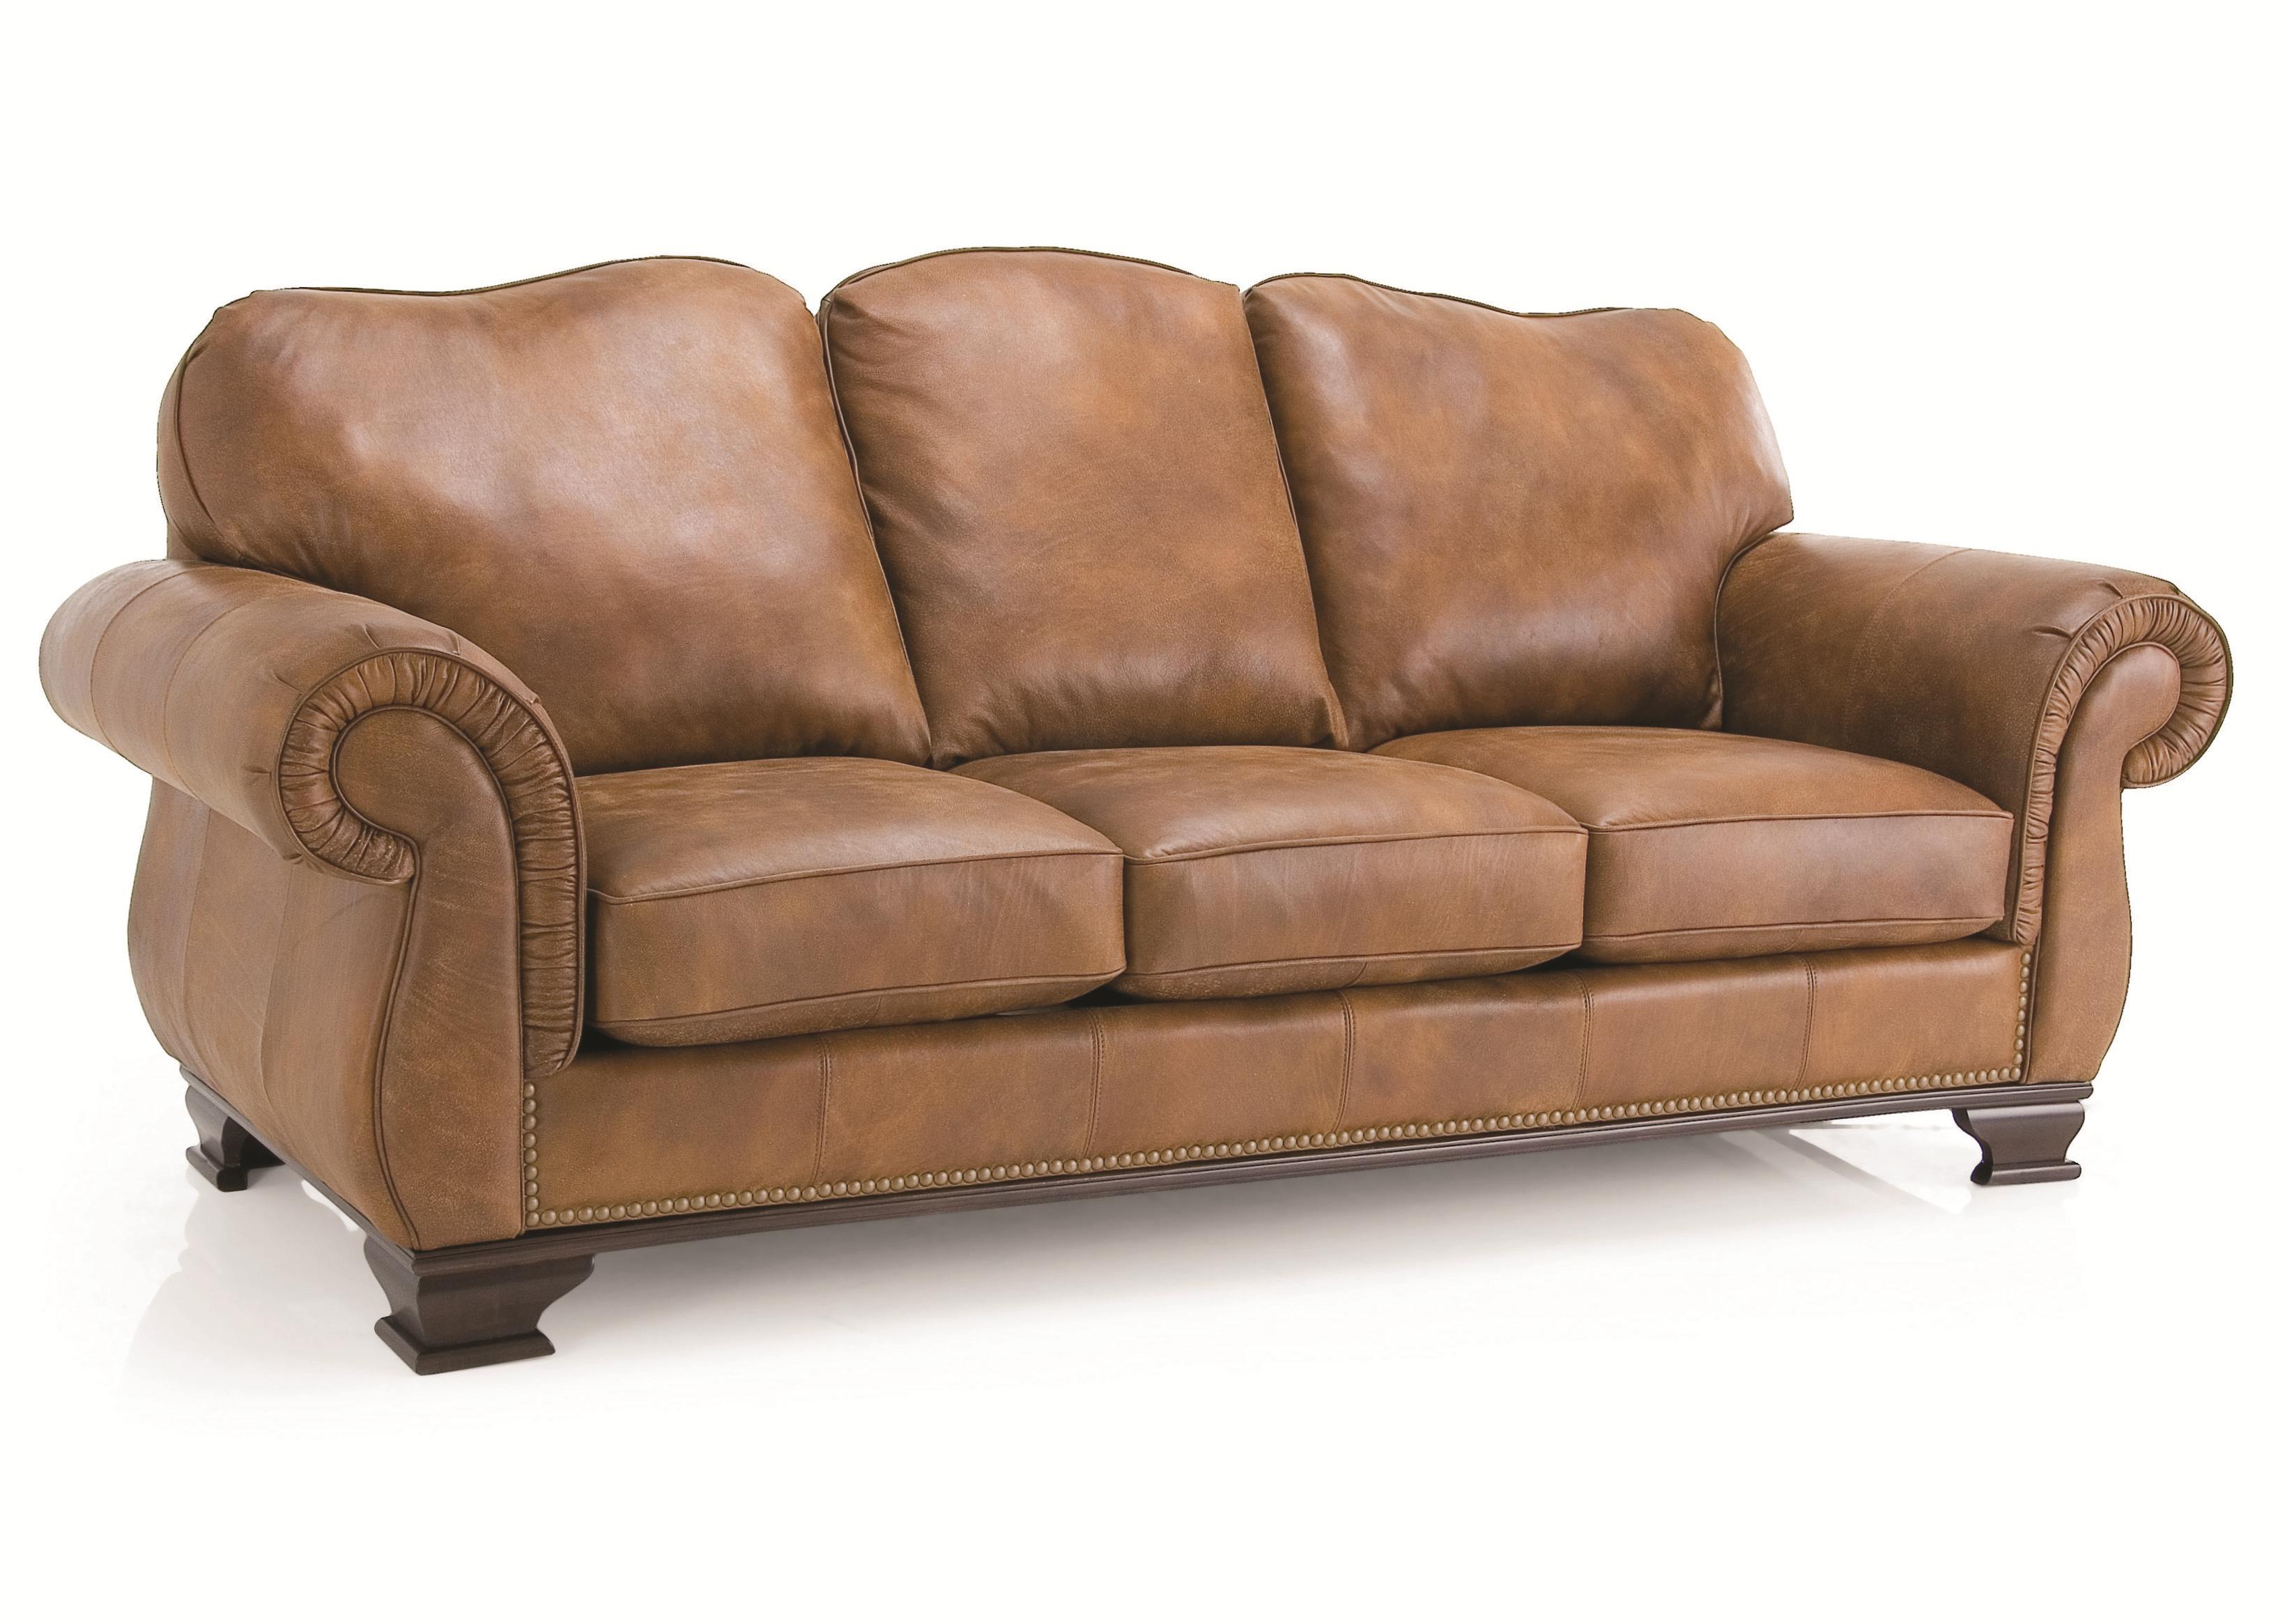 3933 Sofa by Decor-Rest at Johnny Janosik